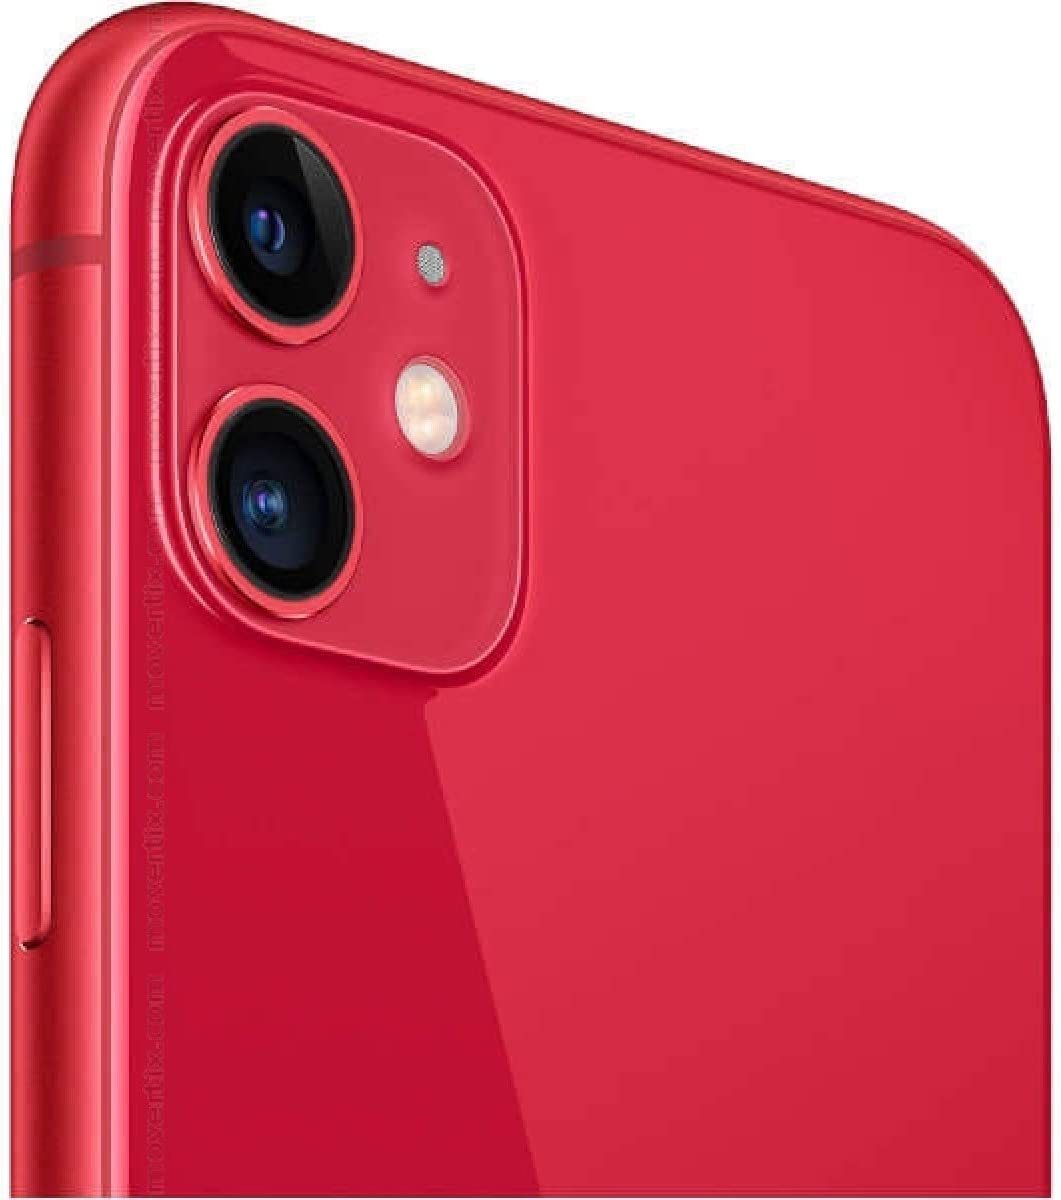 Apple iPhone 11, 128GB, Red - Fully Unlocked (Renewed)